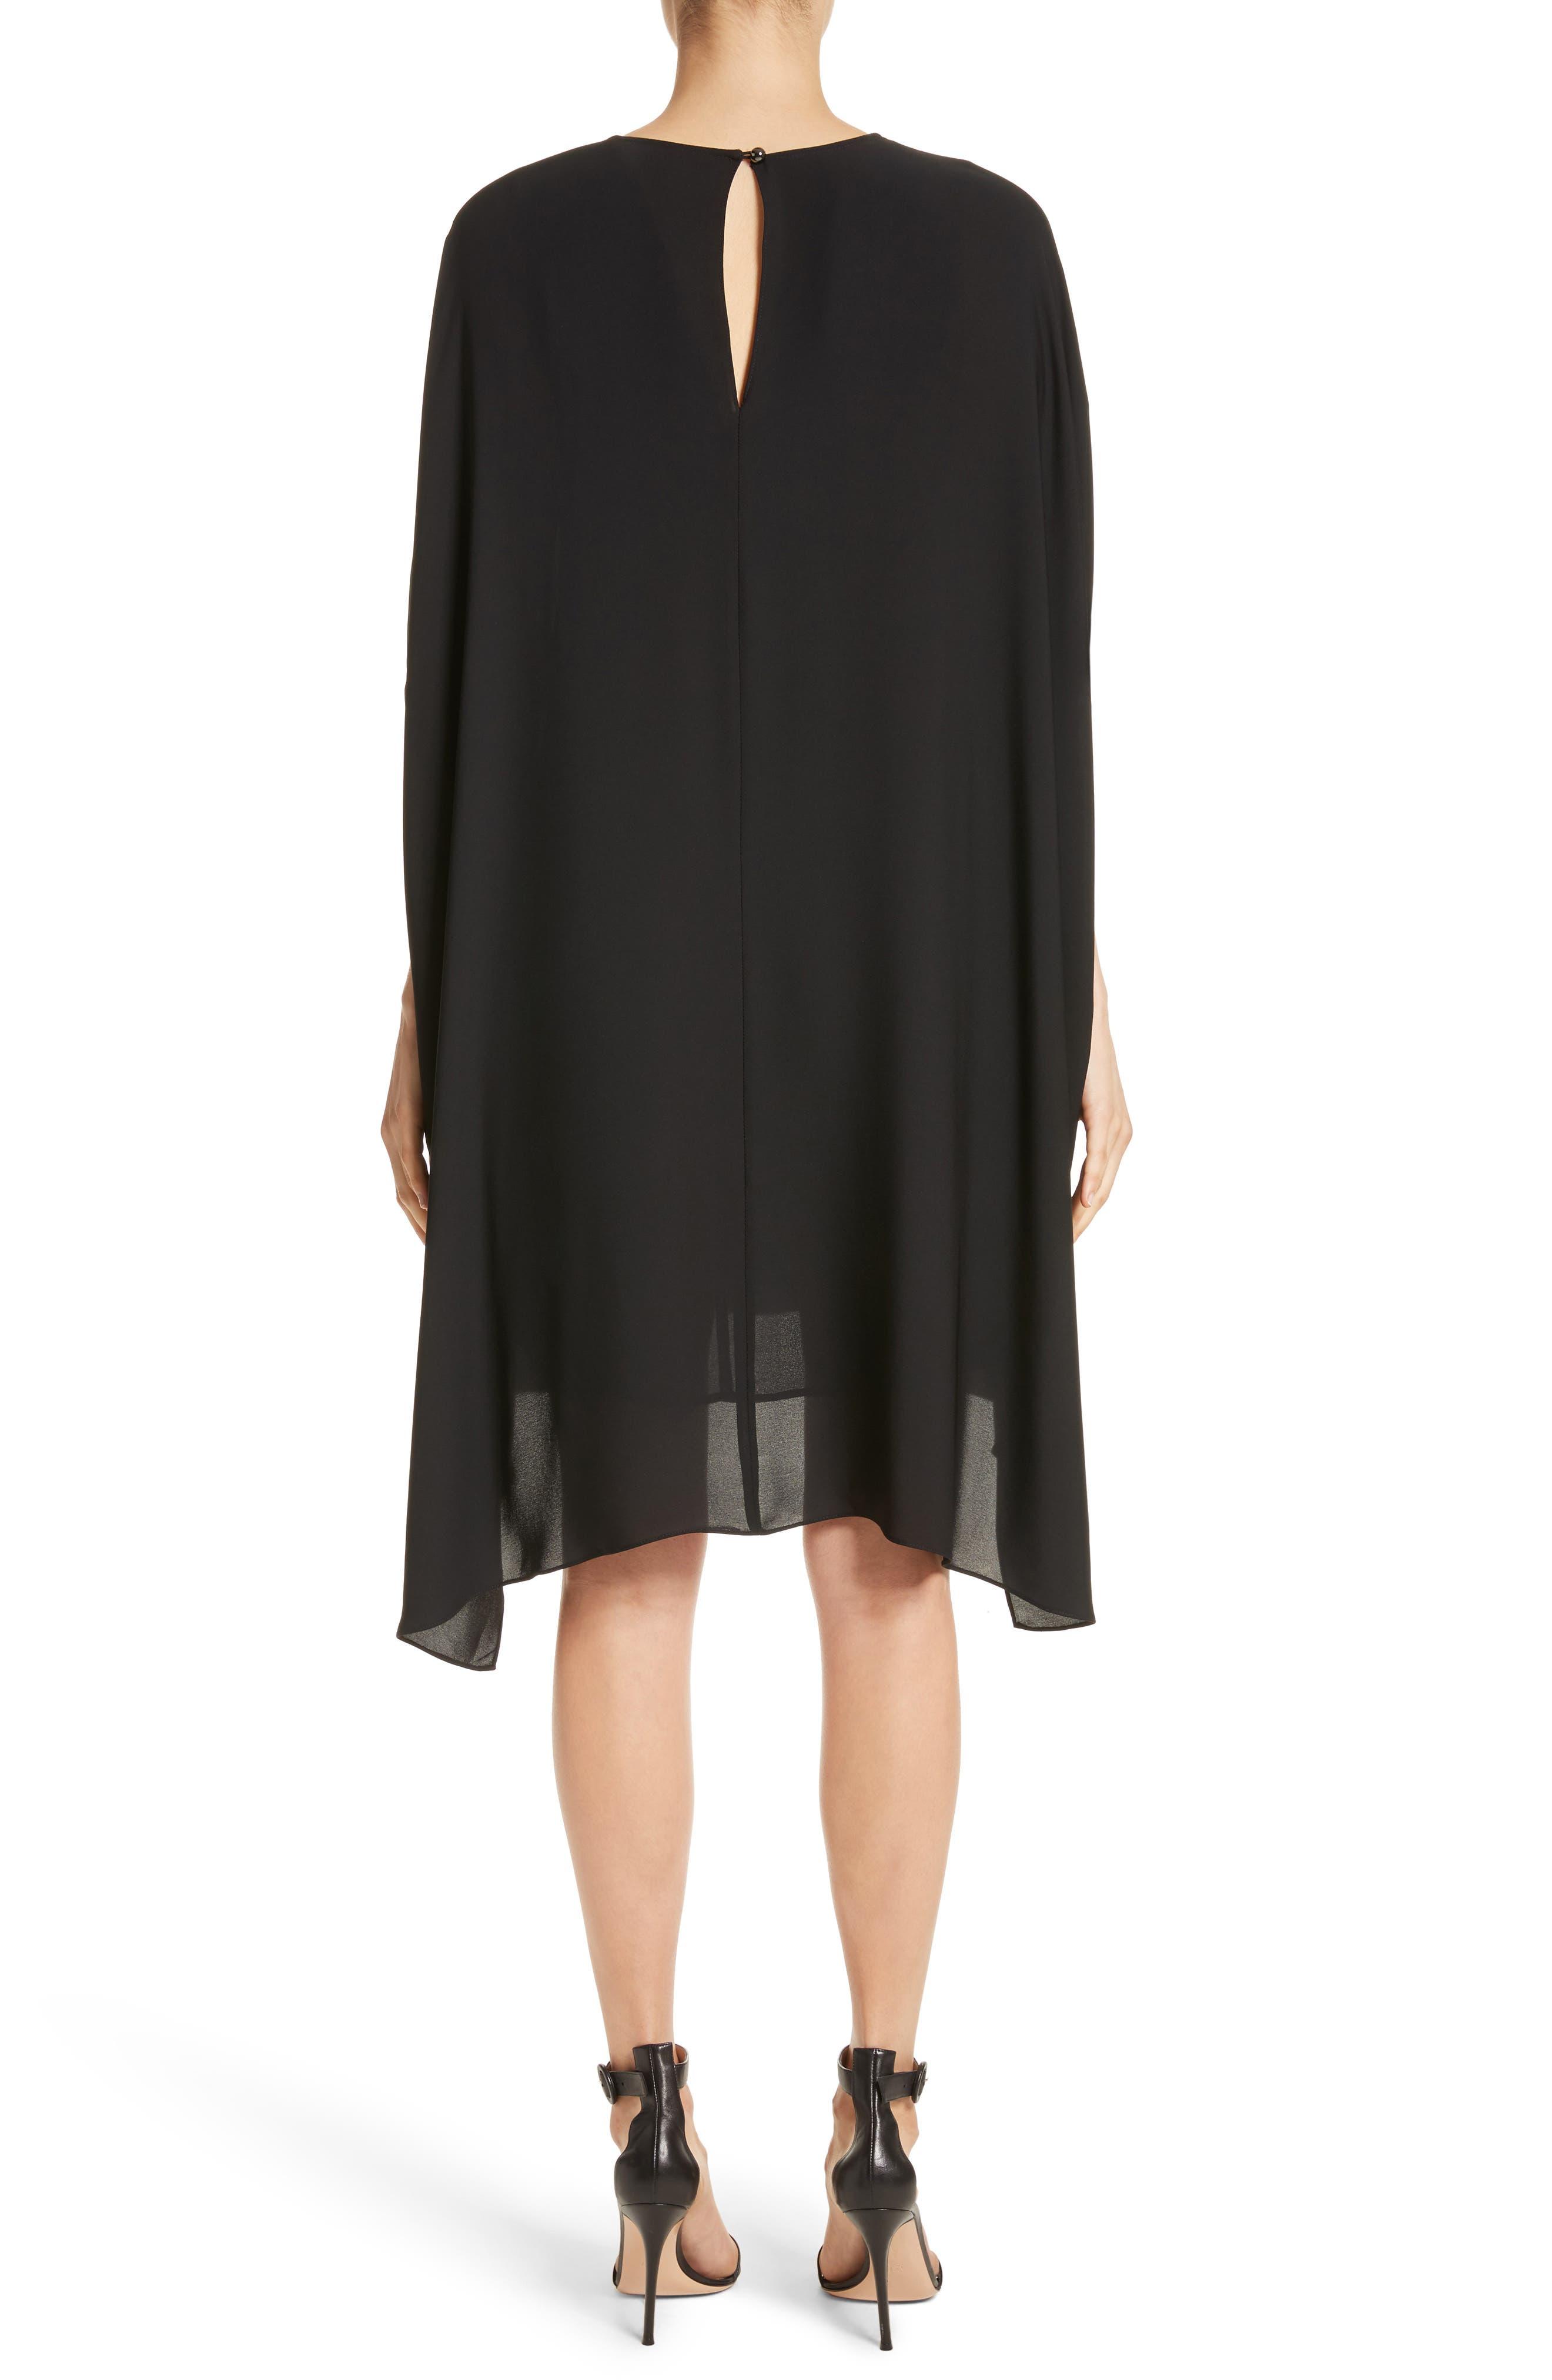 ST. JOHN COLLECTION, Double Silk Georgette Draped Dress, Alternate thumbnail 2, color, CAVIAR